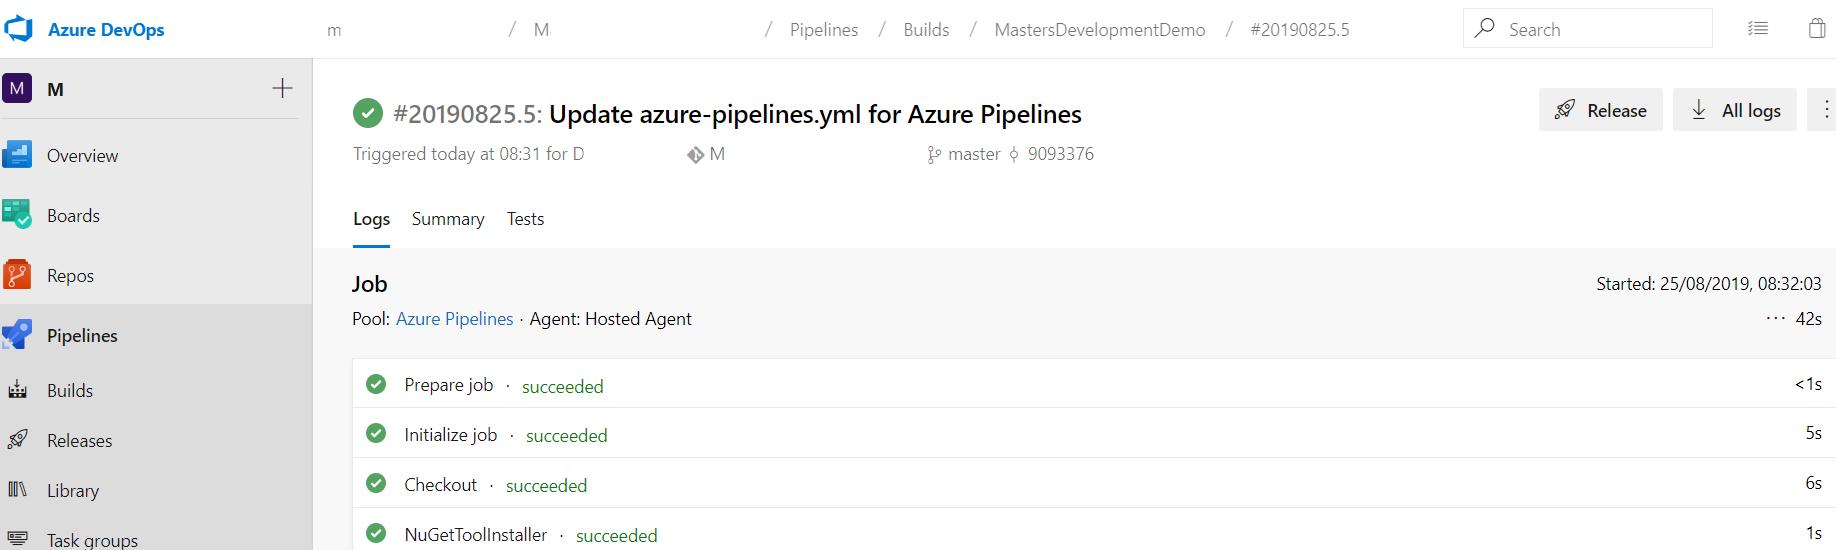 Review Build Pipe Azure DevOps